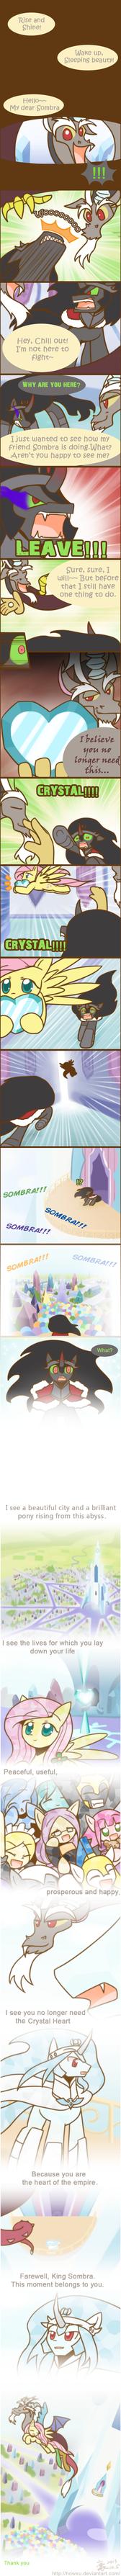 Reforming sequel Sombra by HowXu